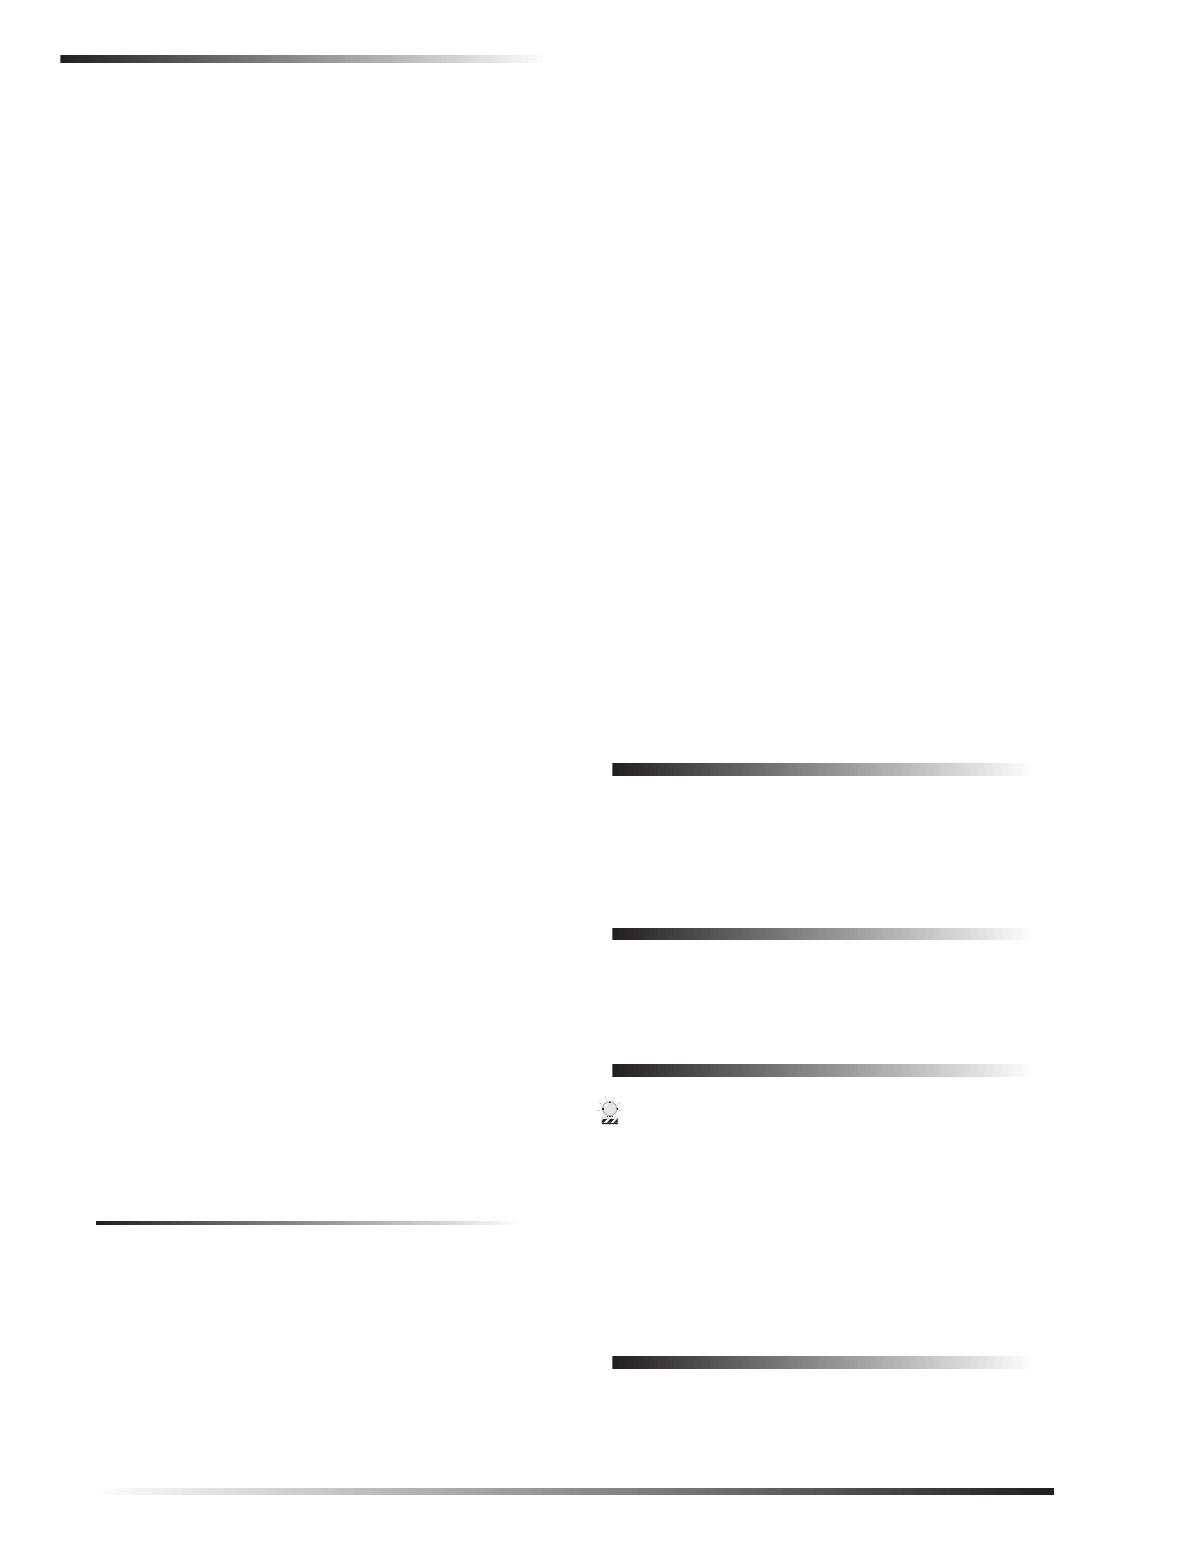 4661632b 60 803 03 Alpha Keypad Installation Manual Diagram Wiring Iti Concord 6superbus 2000 2 X 20 Lcd Alphanumeric Touchpad